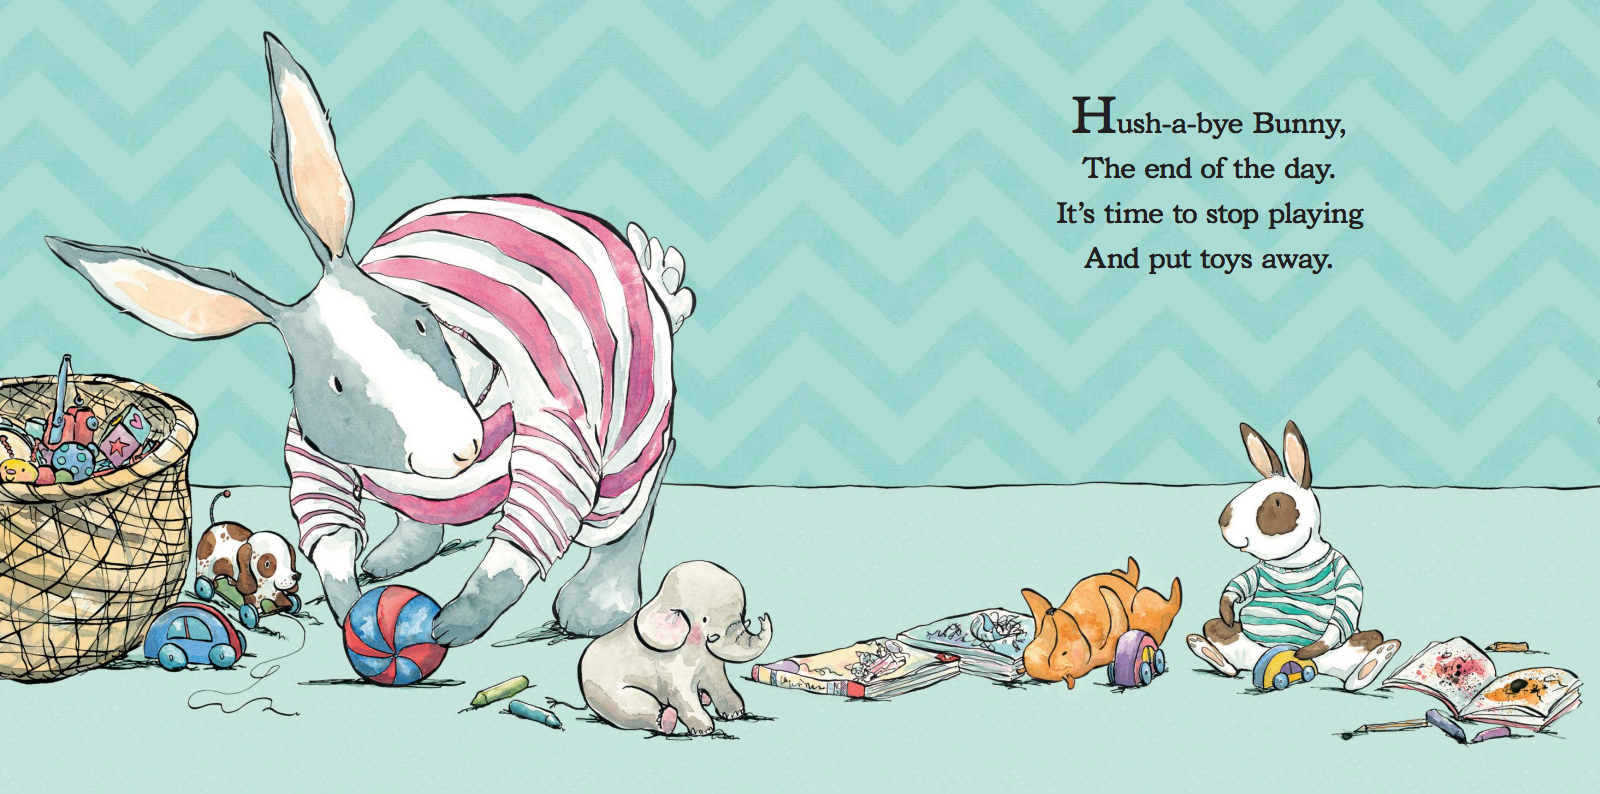 Hush a bye Bunny